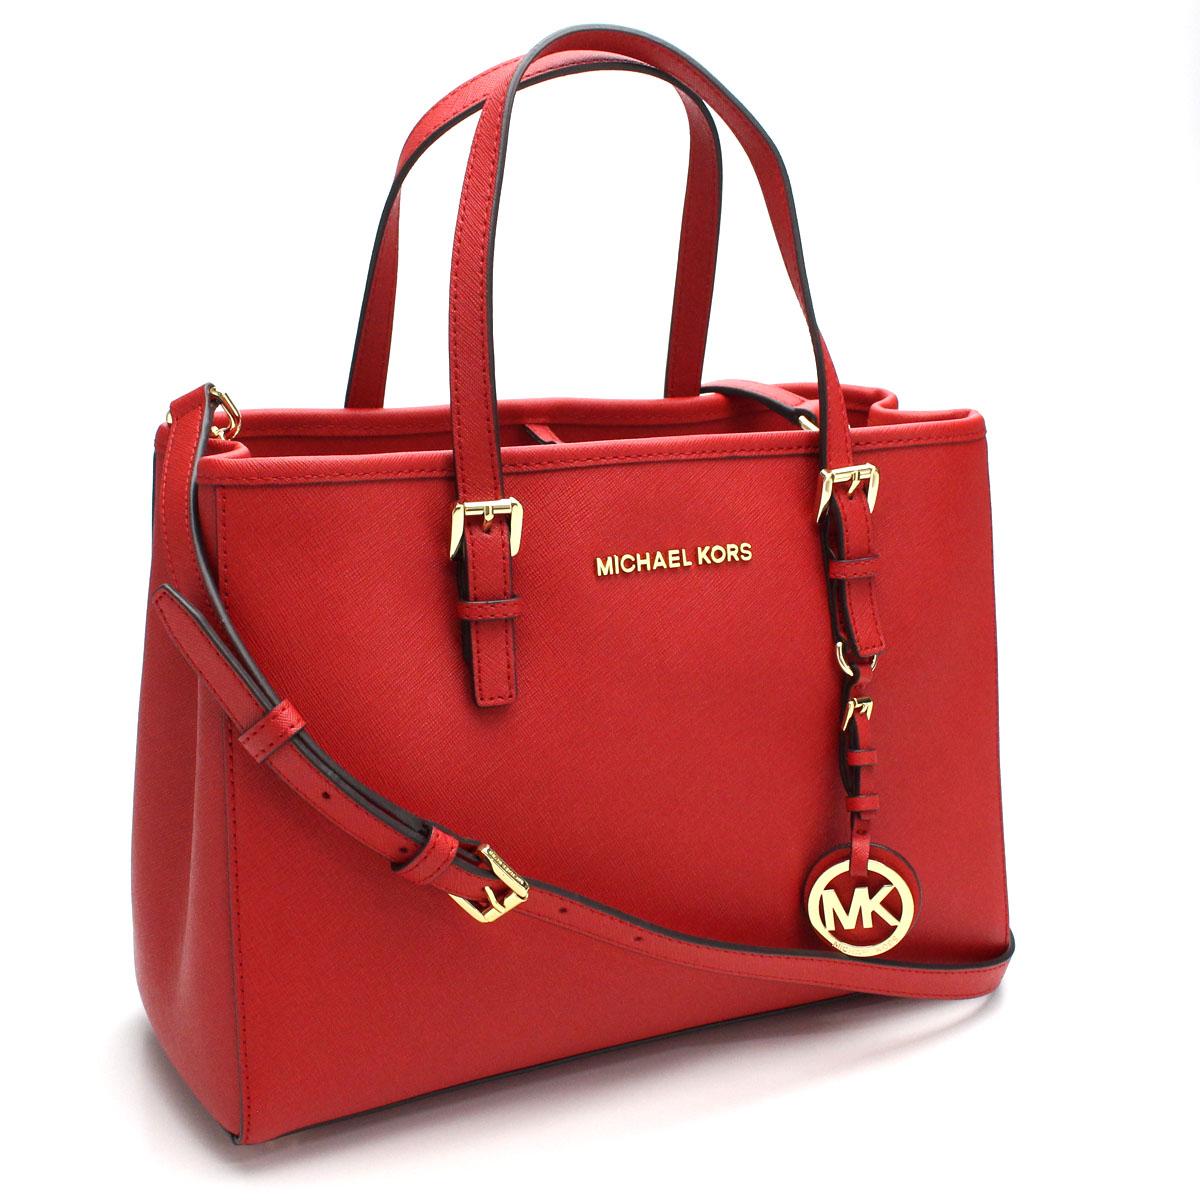 Bighit The total brand wholesale  Michael Kors (MICHAEL KORS) JET SET  TRAVEL tote bag 30H3GTVT8L BRIGHT RED red system  37f986193bd3